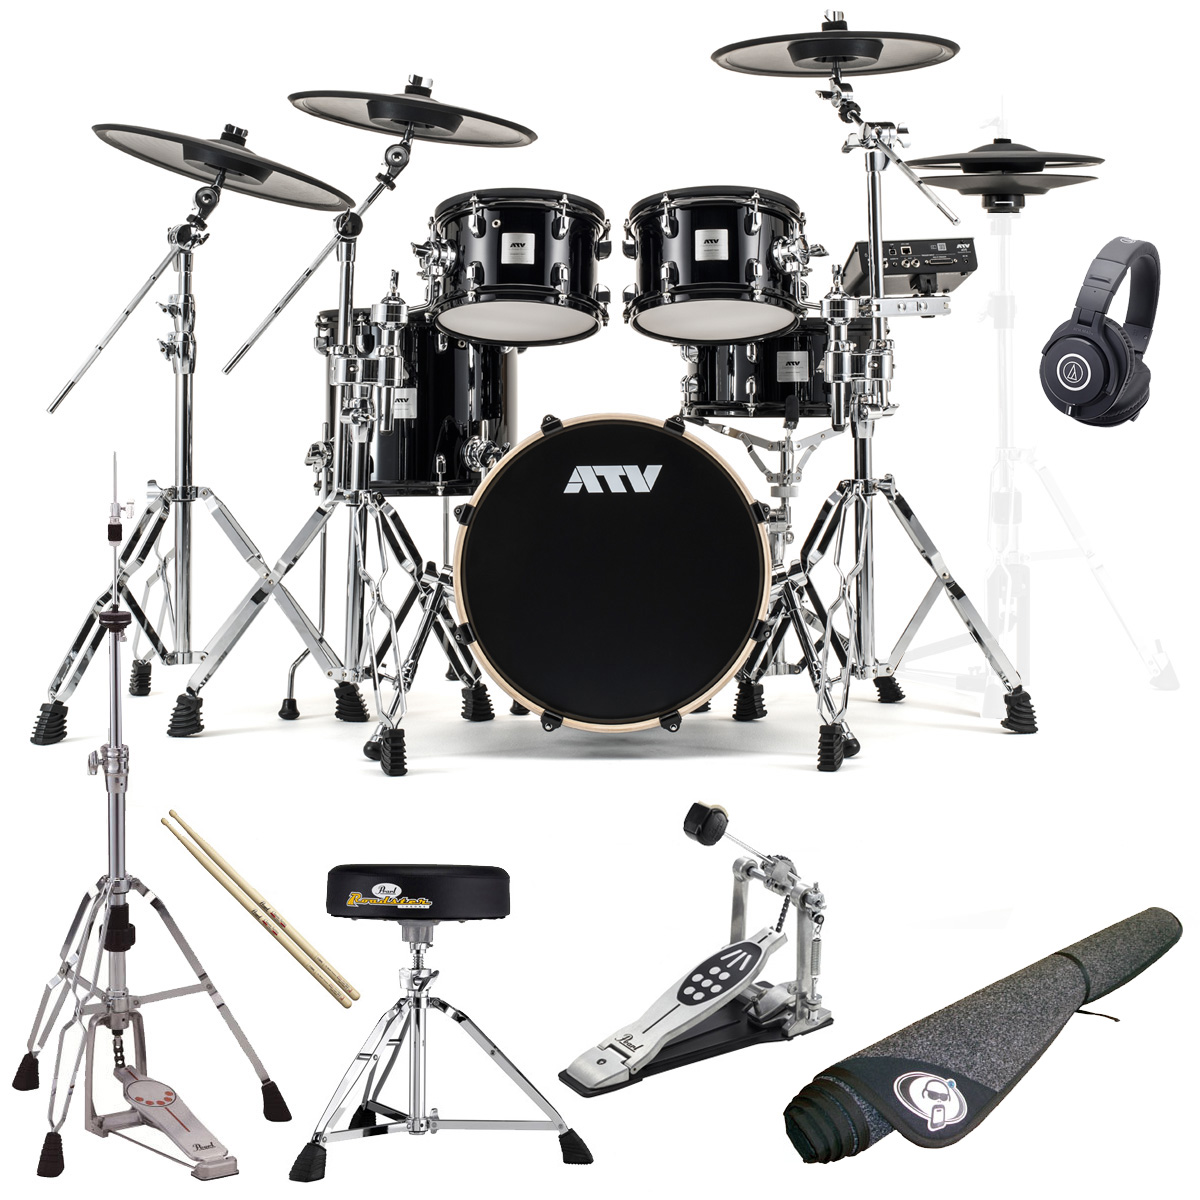 ATV / aDrums artist Expanded Set ADA-EXPSET オリジナルスターターパックP プロラケ・ドラムマット付き